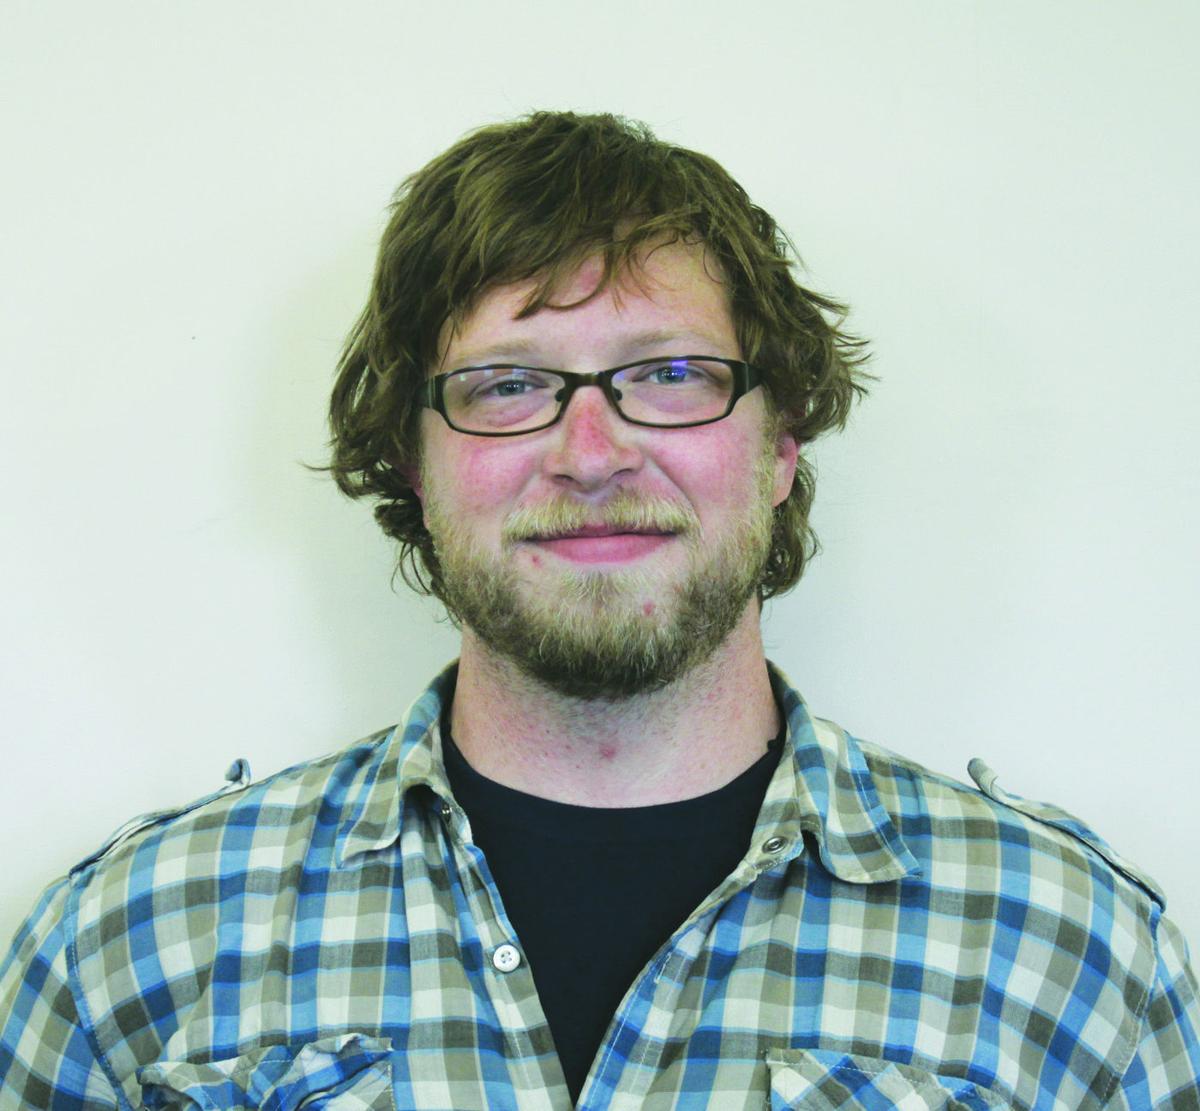 Former Graphic employee Luke Arbuckle